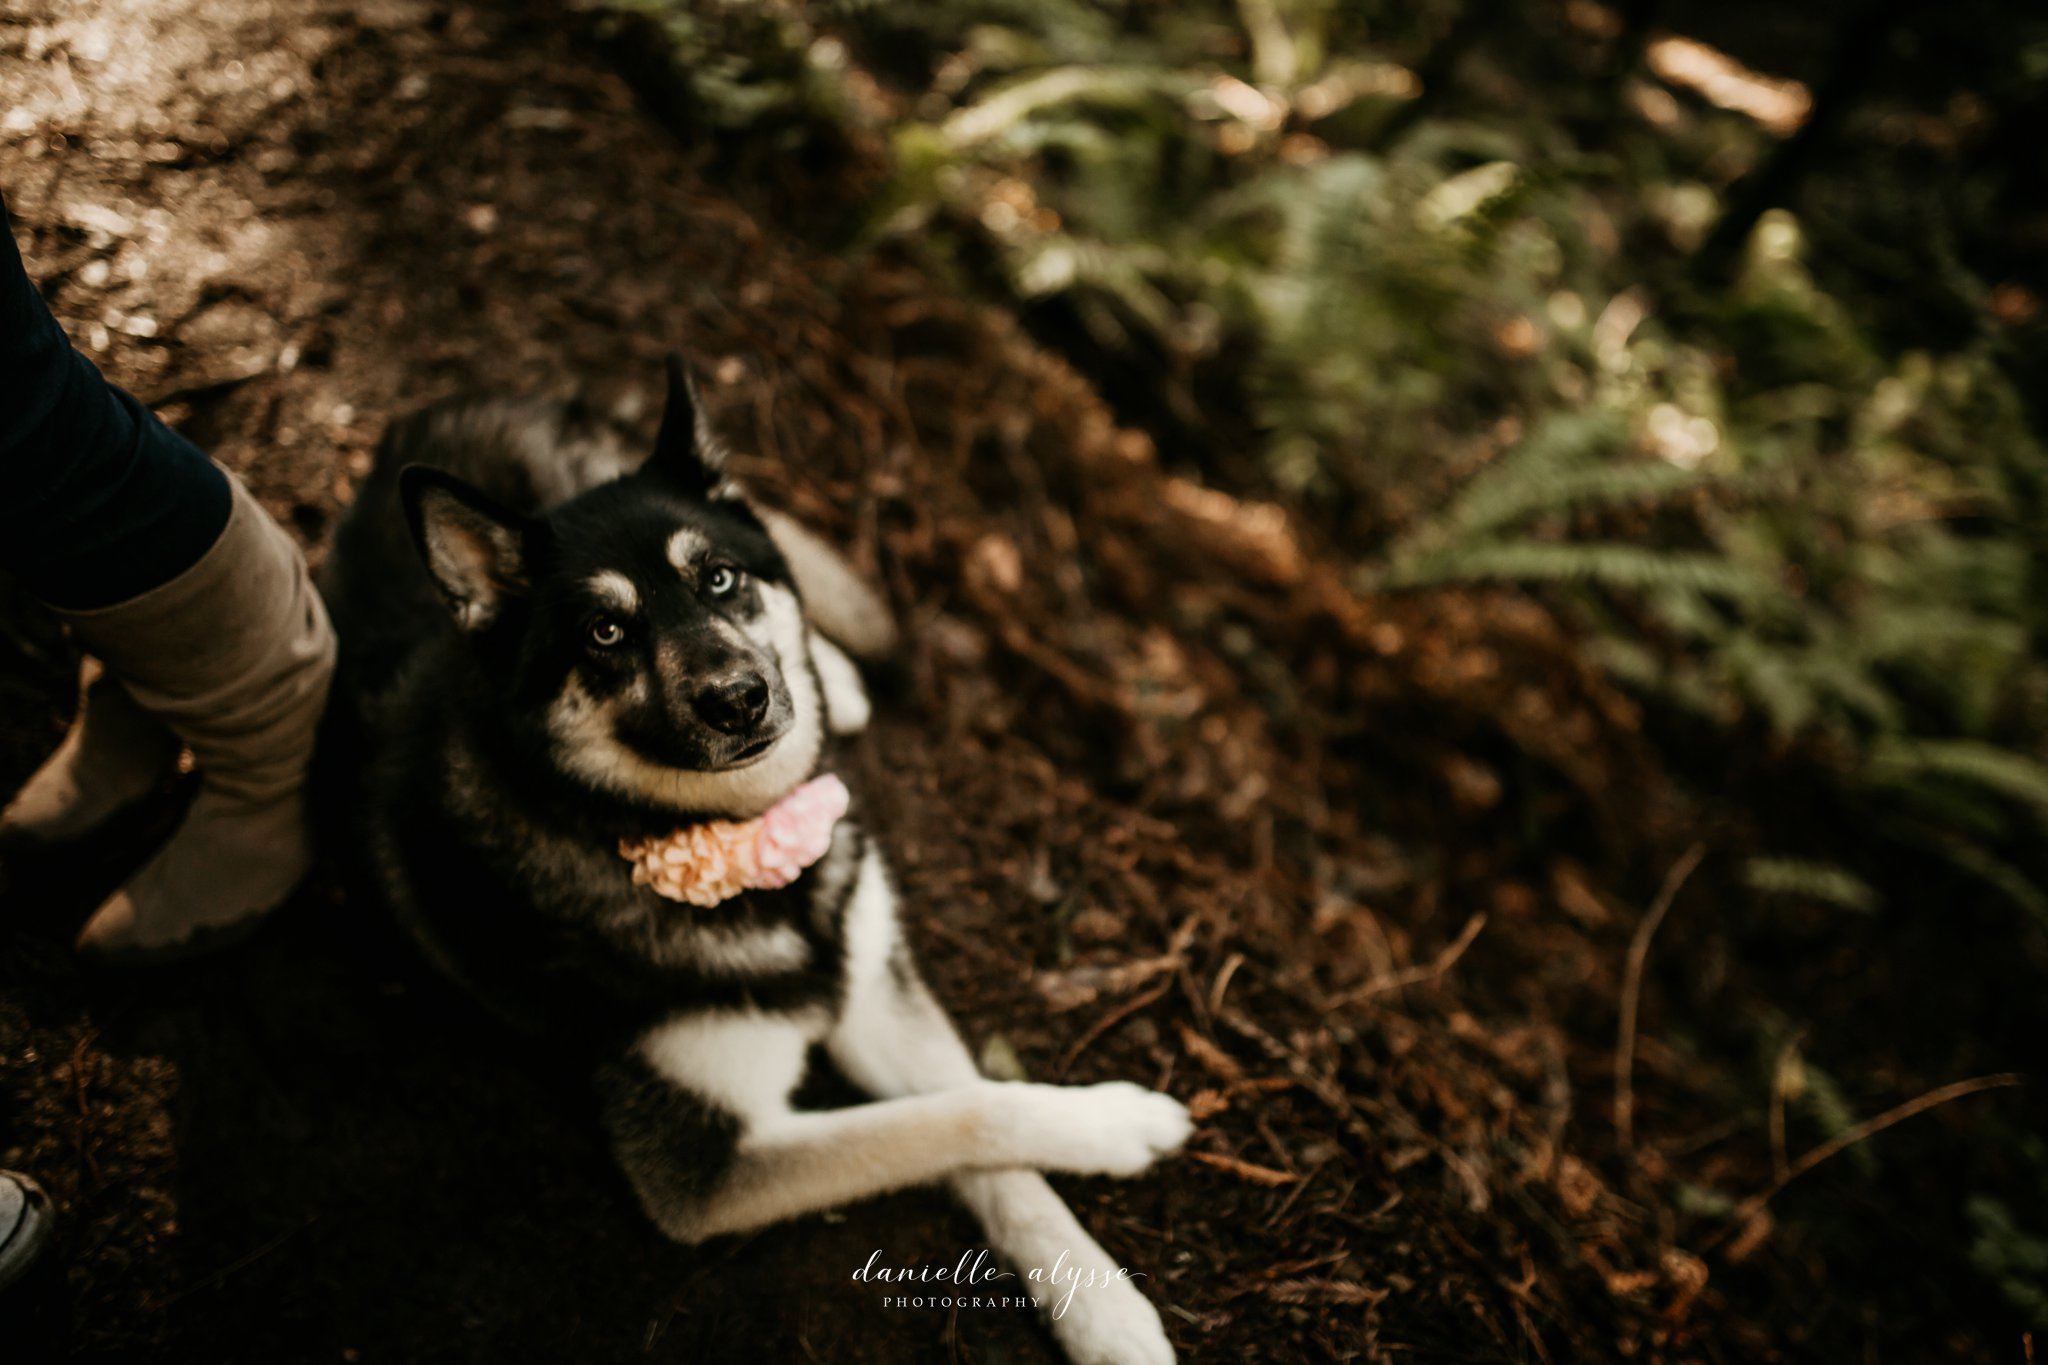 190205_engagement_jen_steven_muir_woods_mill_valley_danielle_alysse_photography_peek_6_WEB.jpg